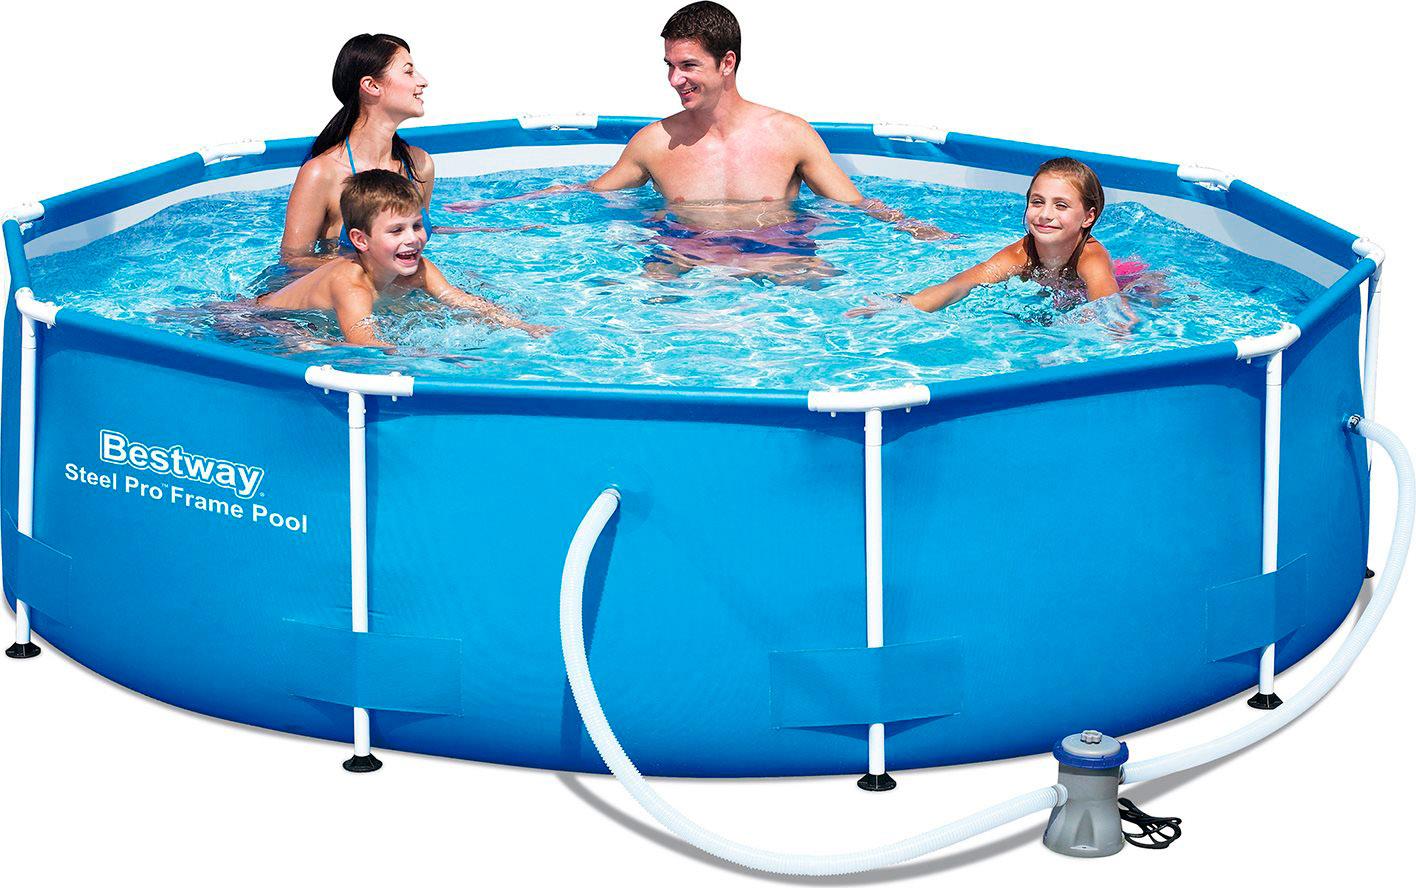 Piscina fuori terra bestway telaio portante rotonda 305x76 for Pompa x piscina esterna